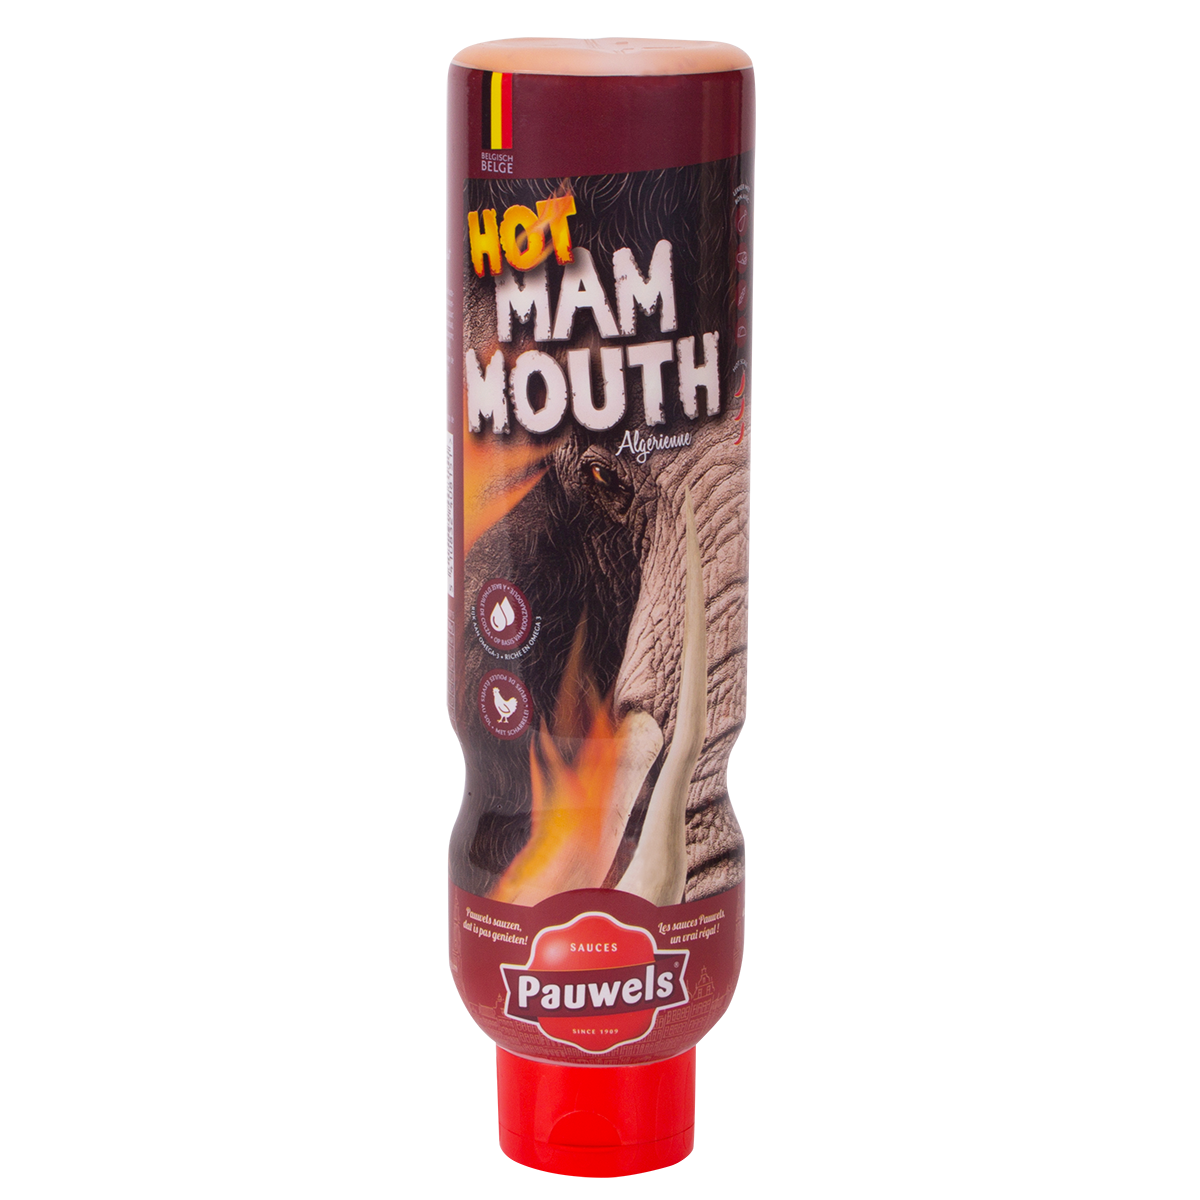 Hot Mammouth van Pauwels Sauzen in 1 liter tube